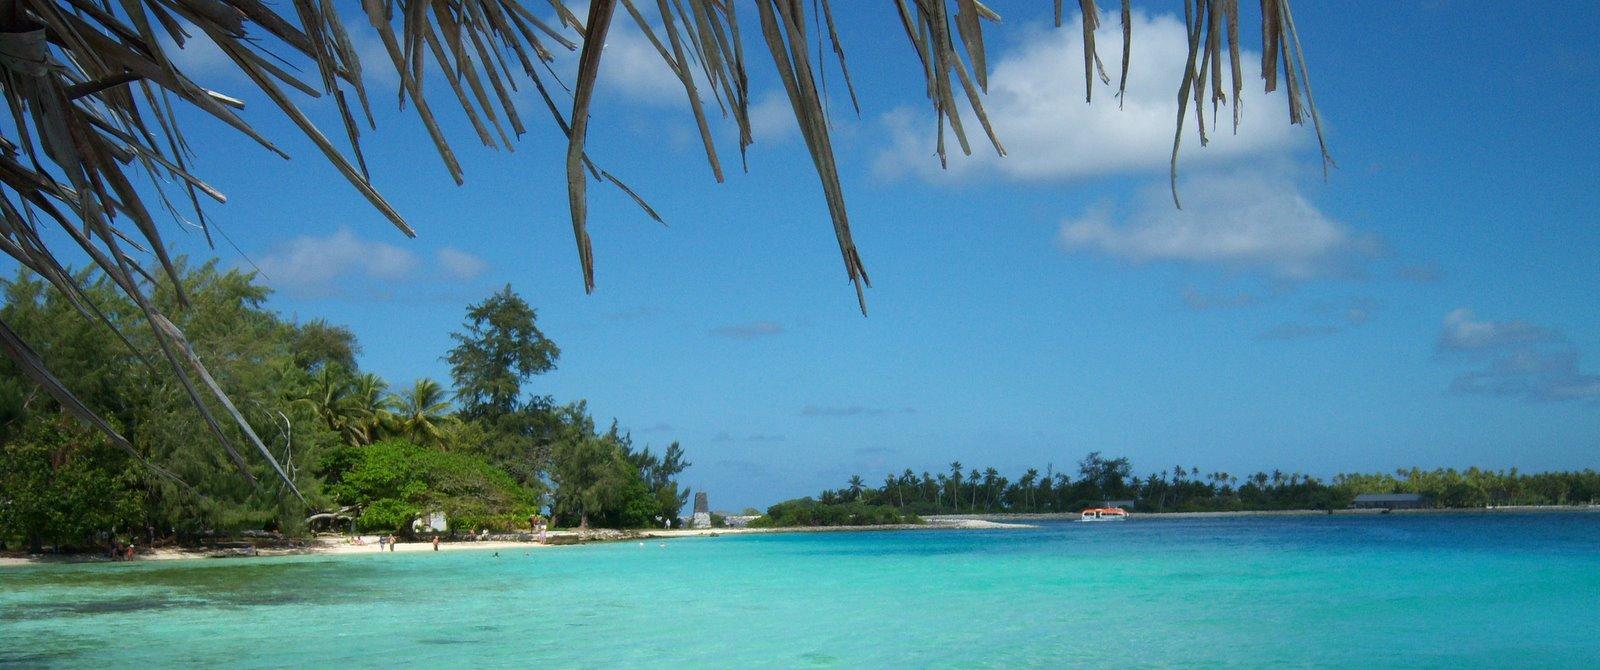 Cruise 2011 To Tahiti Fanning Island Day 17